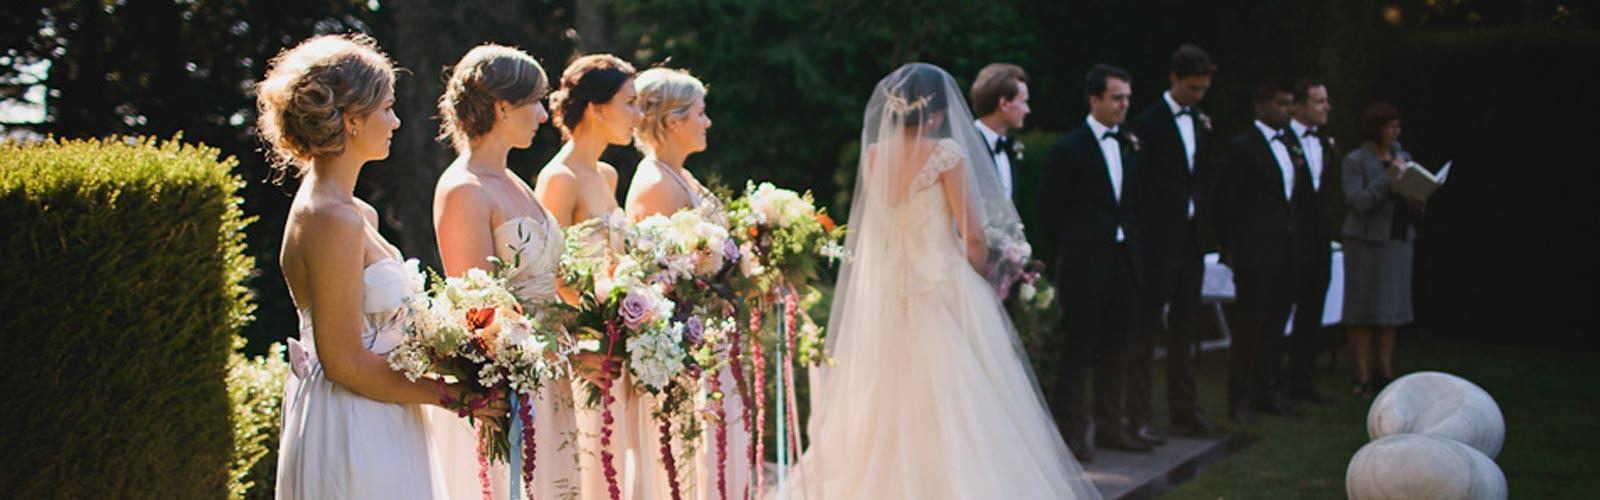 Weddings Venue Hire Larnach Castle Gardens New Zealands